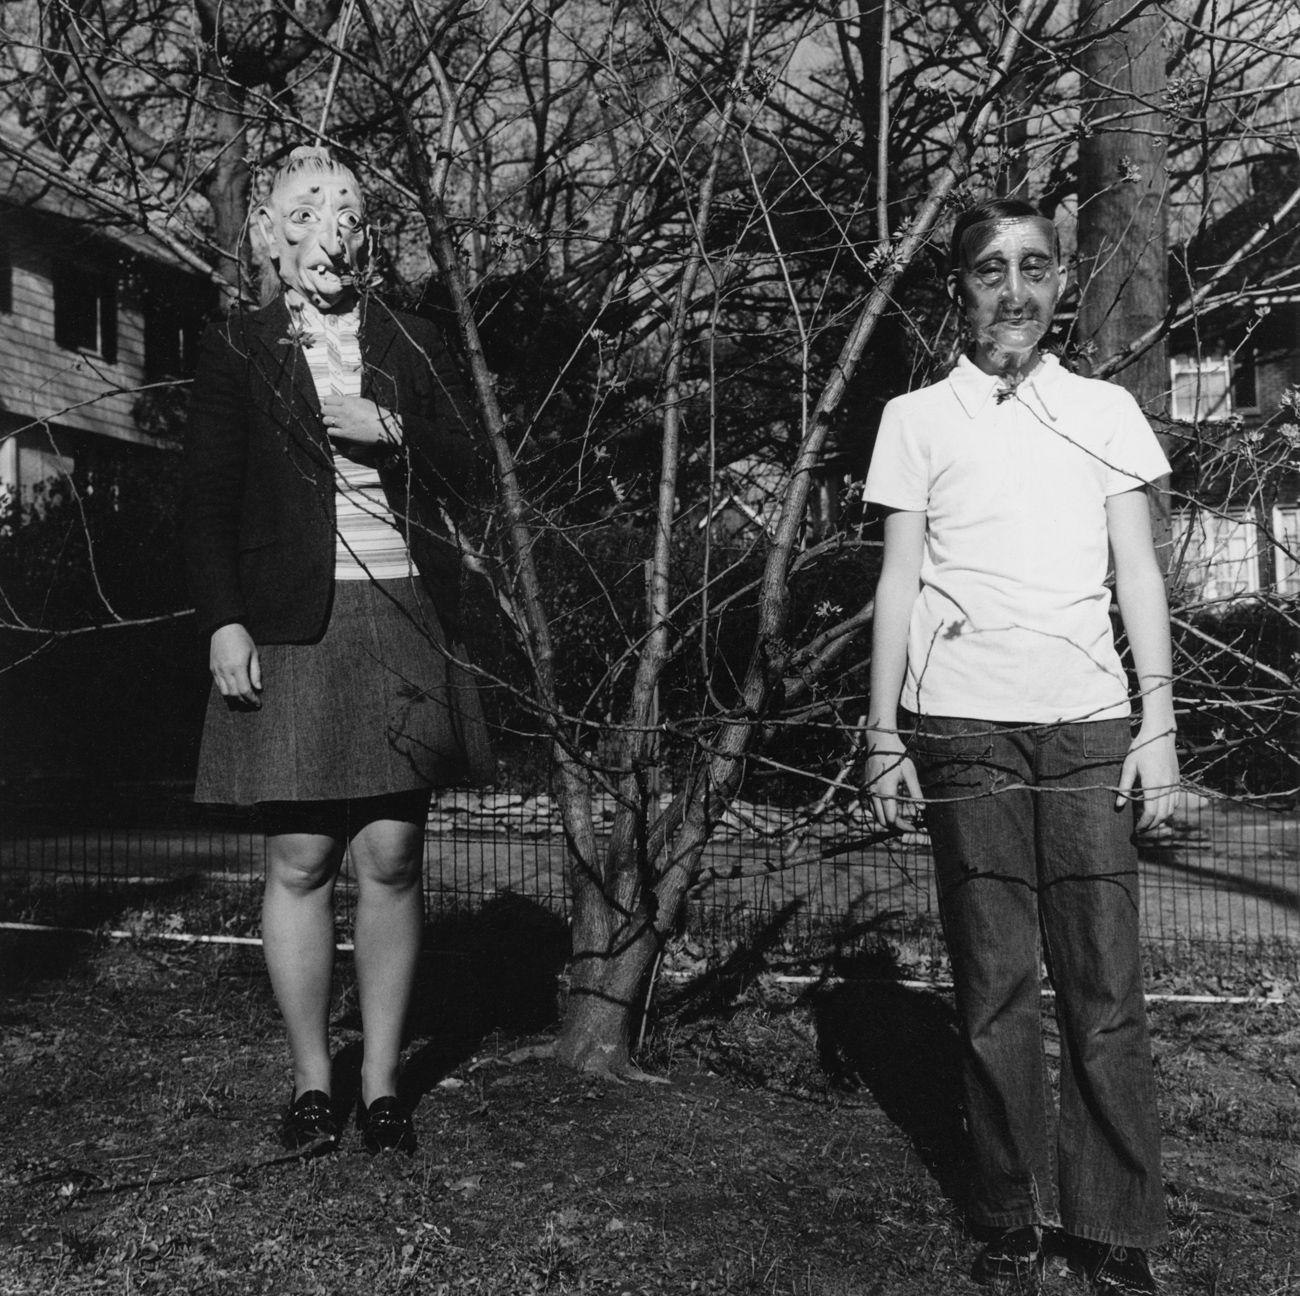 Same [One of seven kids of Mertonian friend], 1970-72